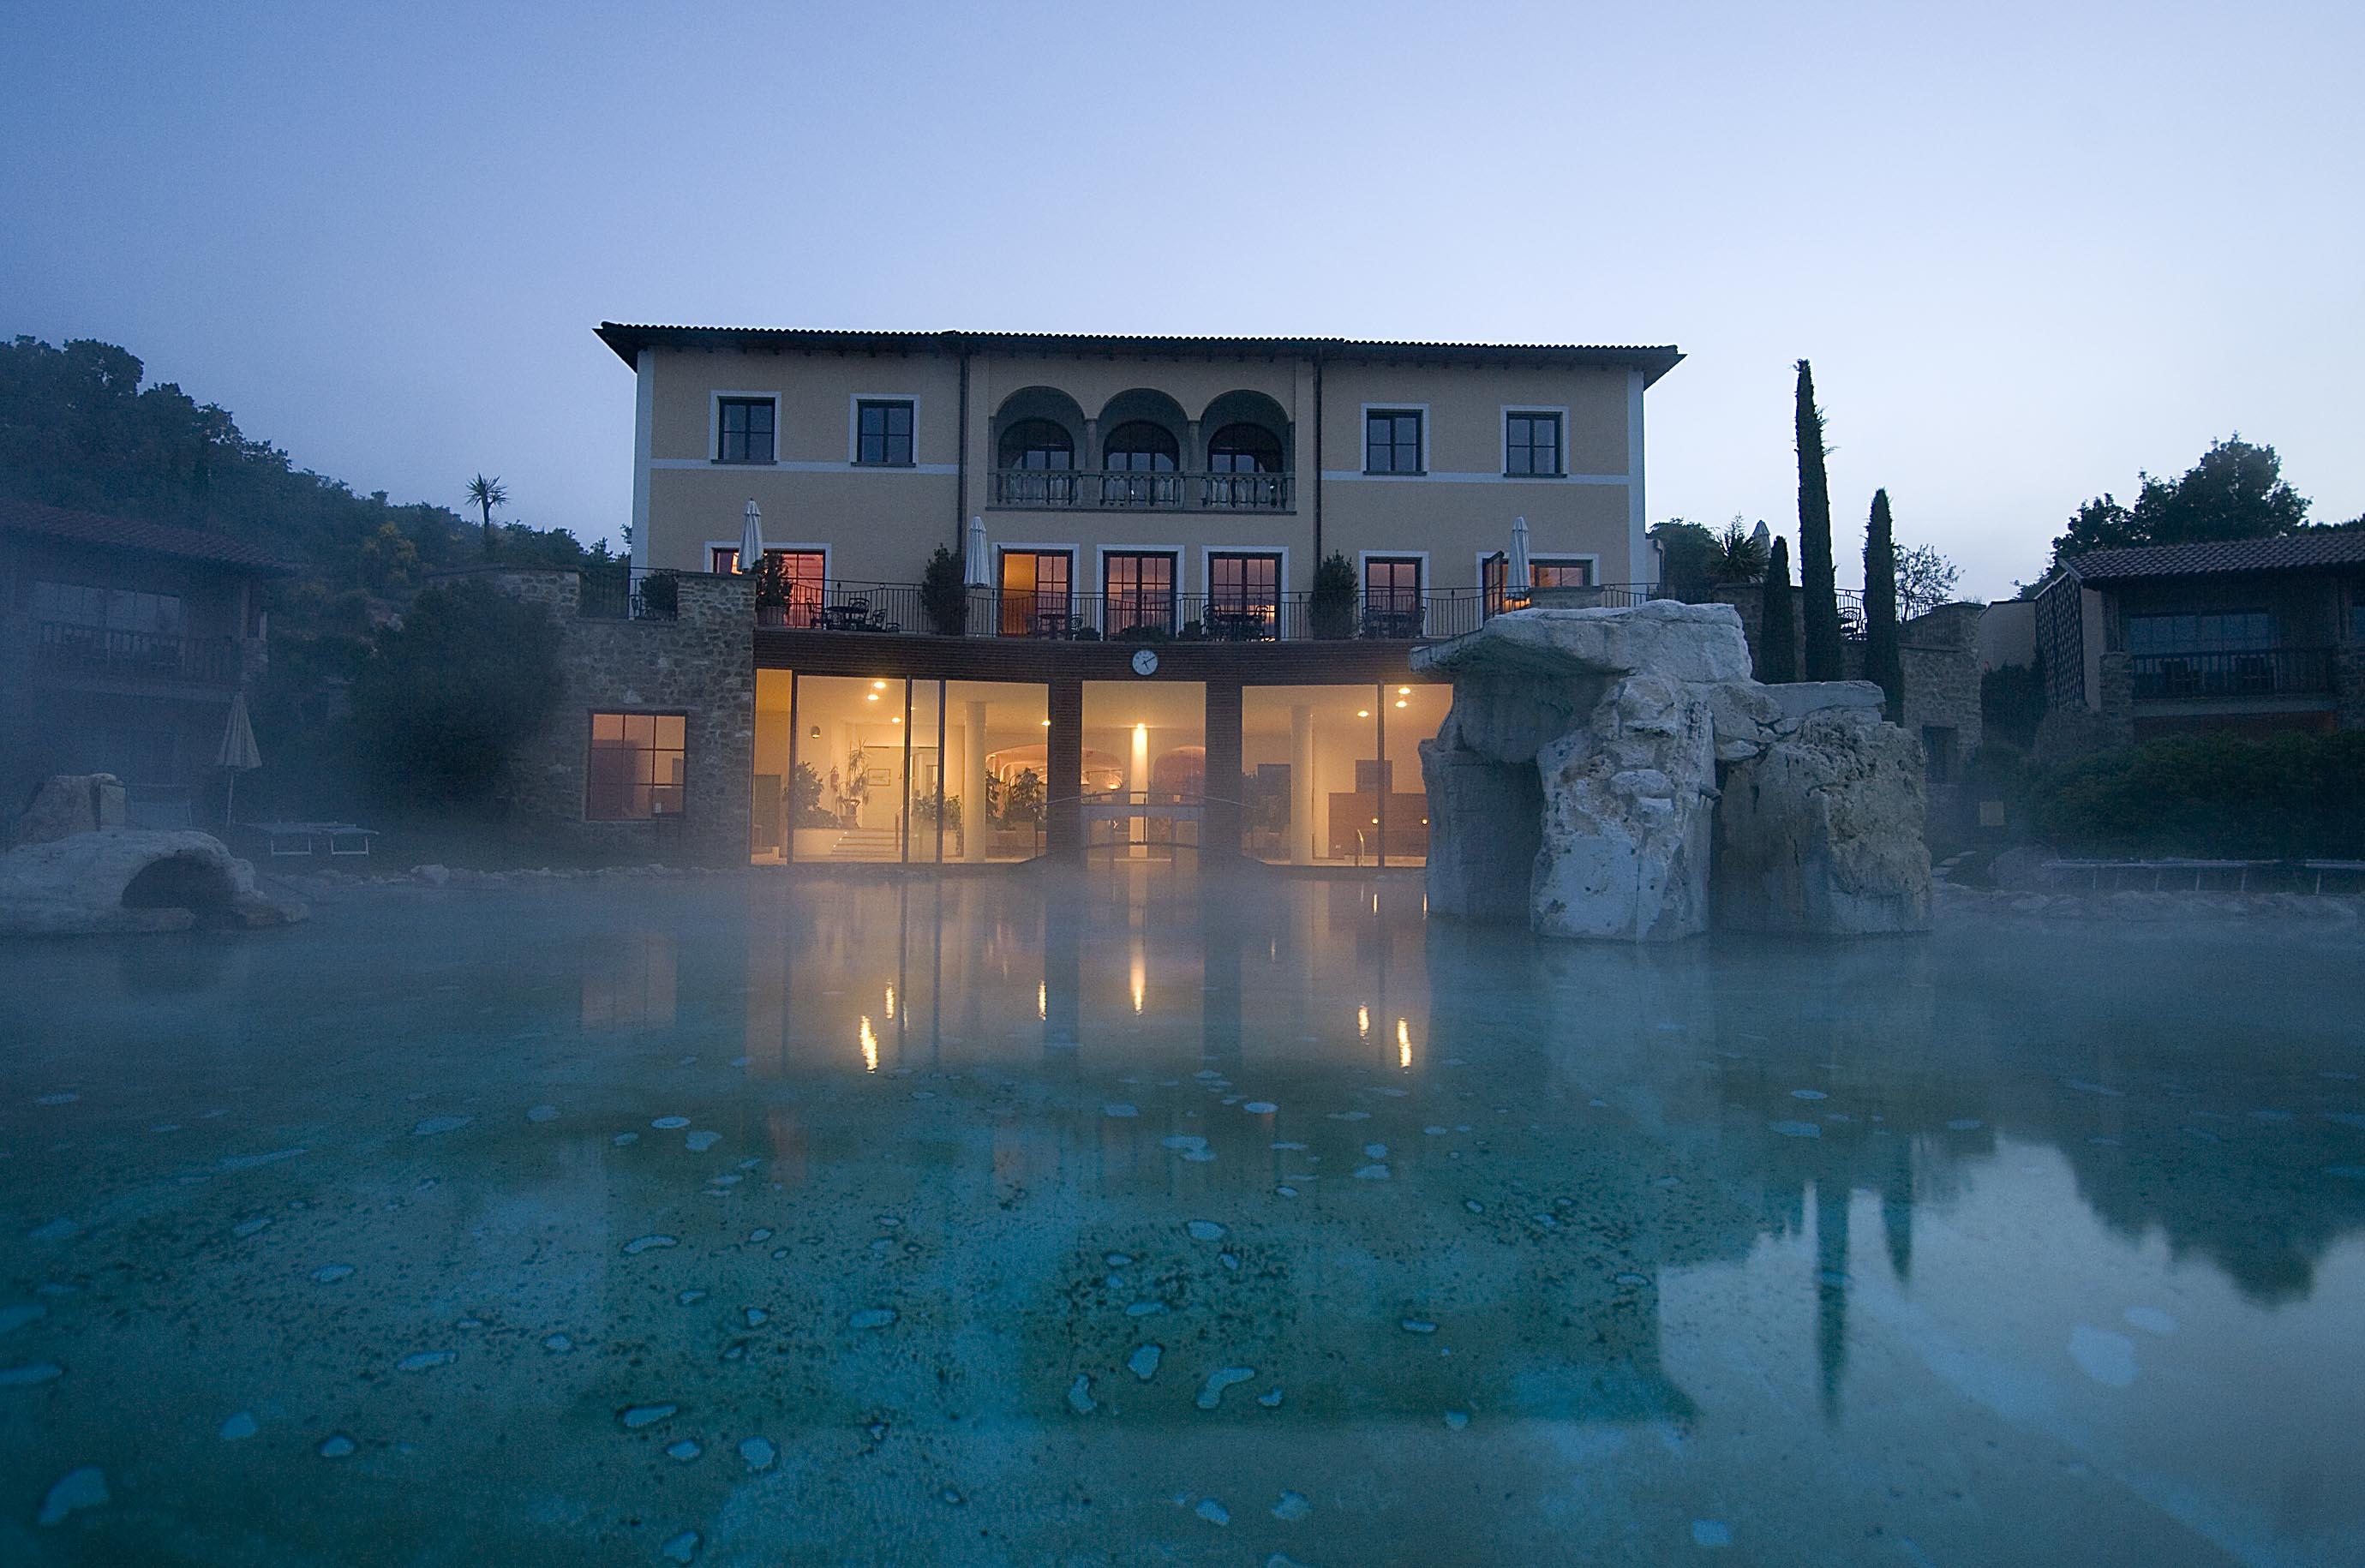 Adler Thermae Hotel, Bagno Vignoni, Tuscany, Italy - Palamedes PR